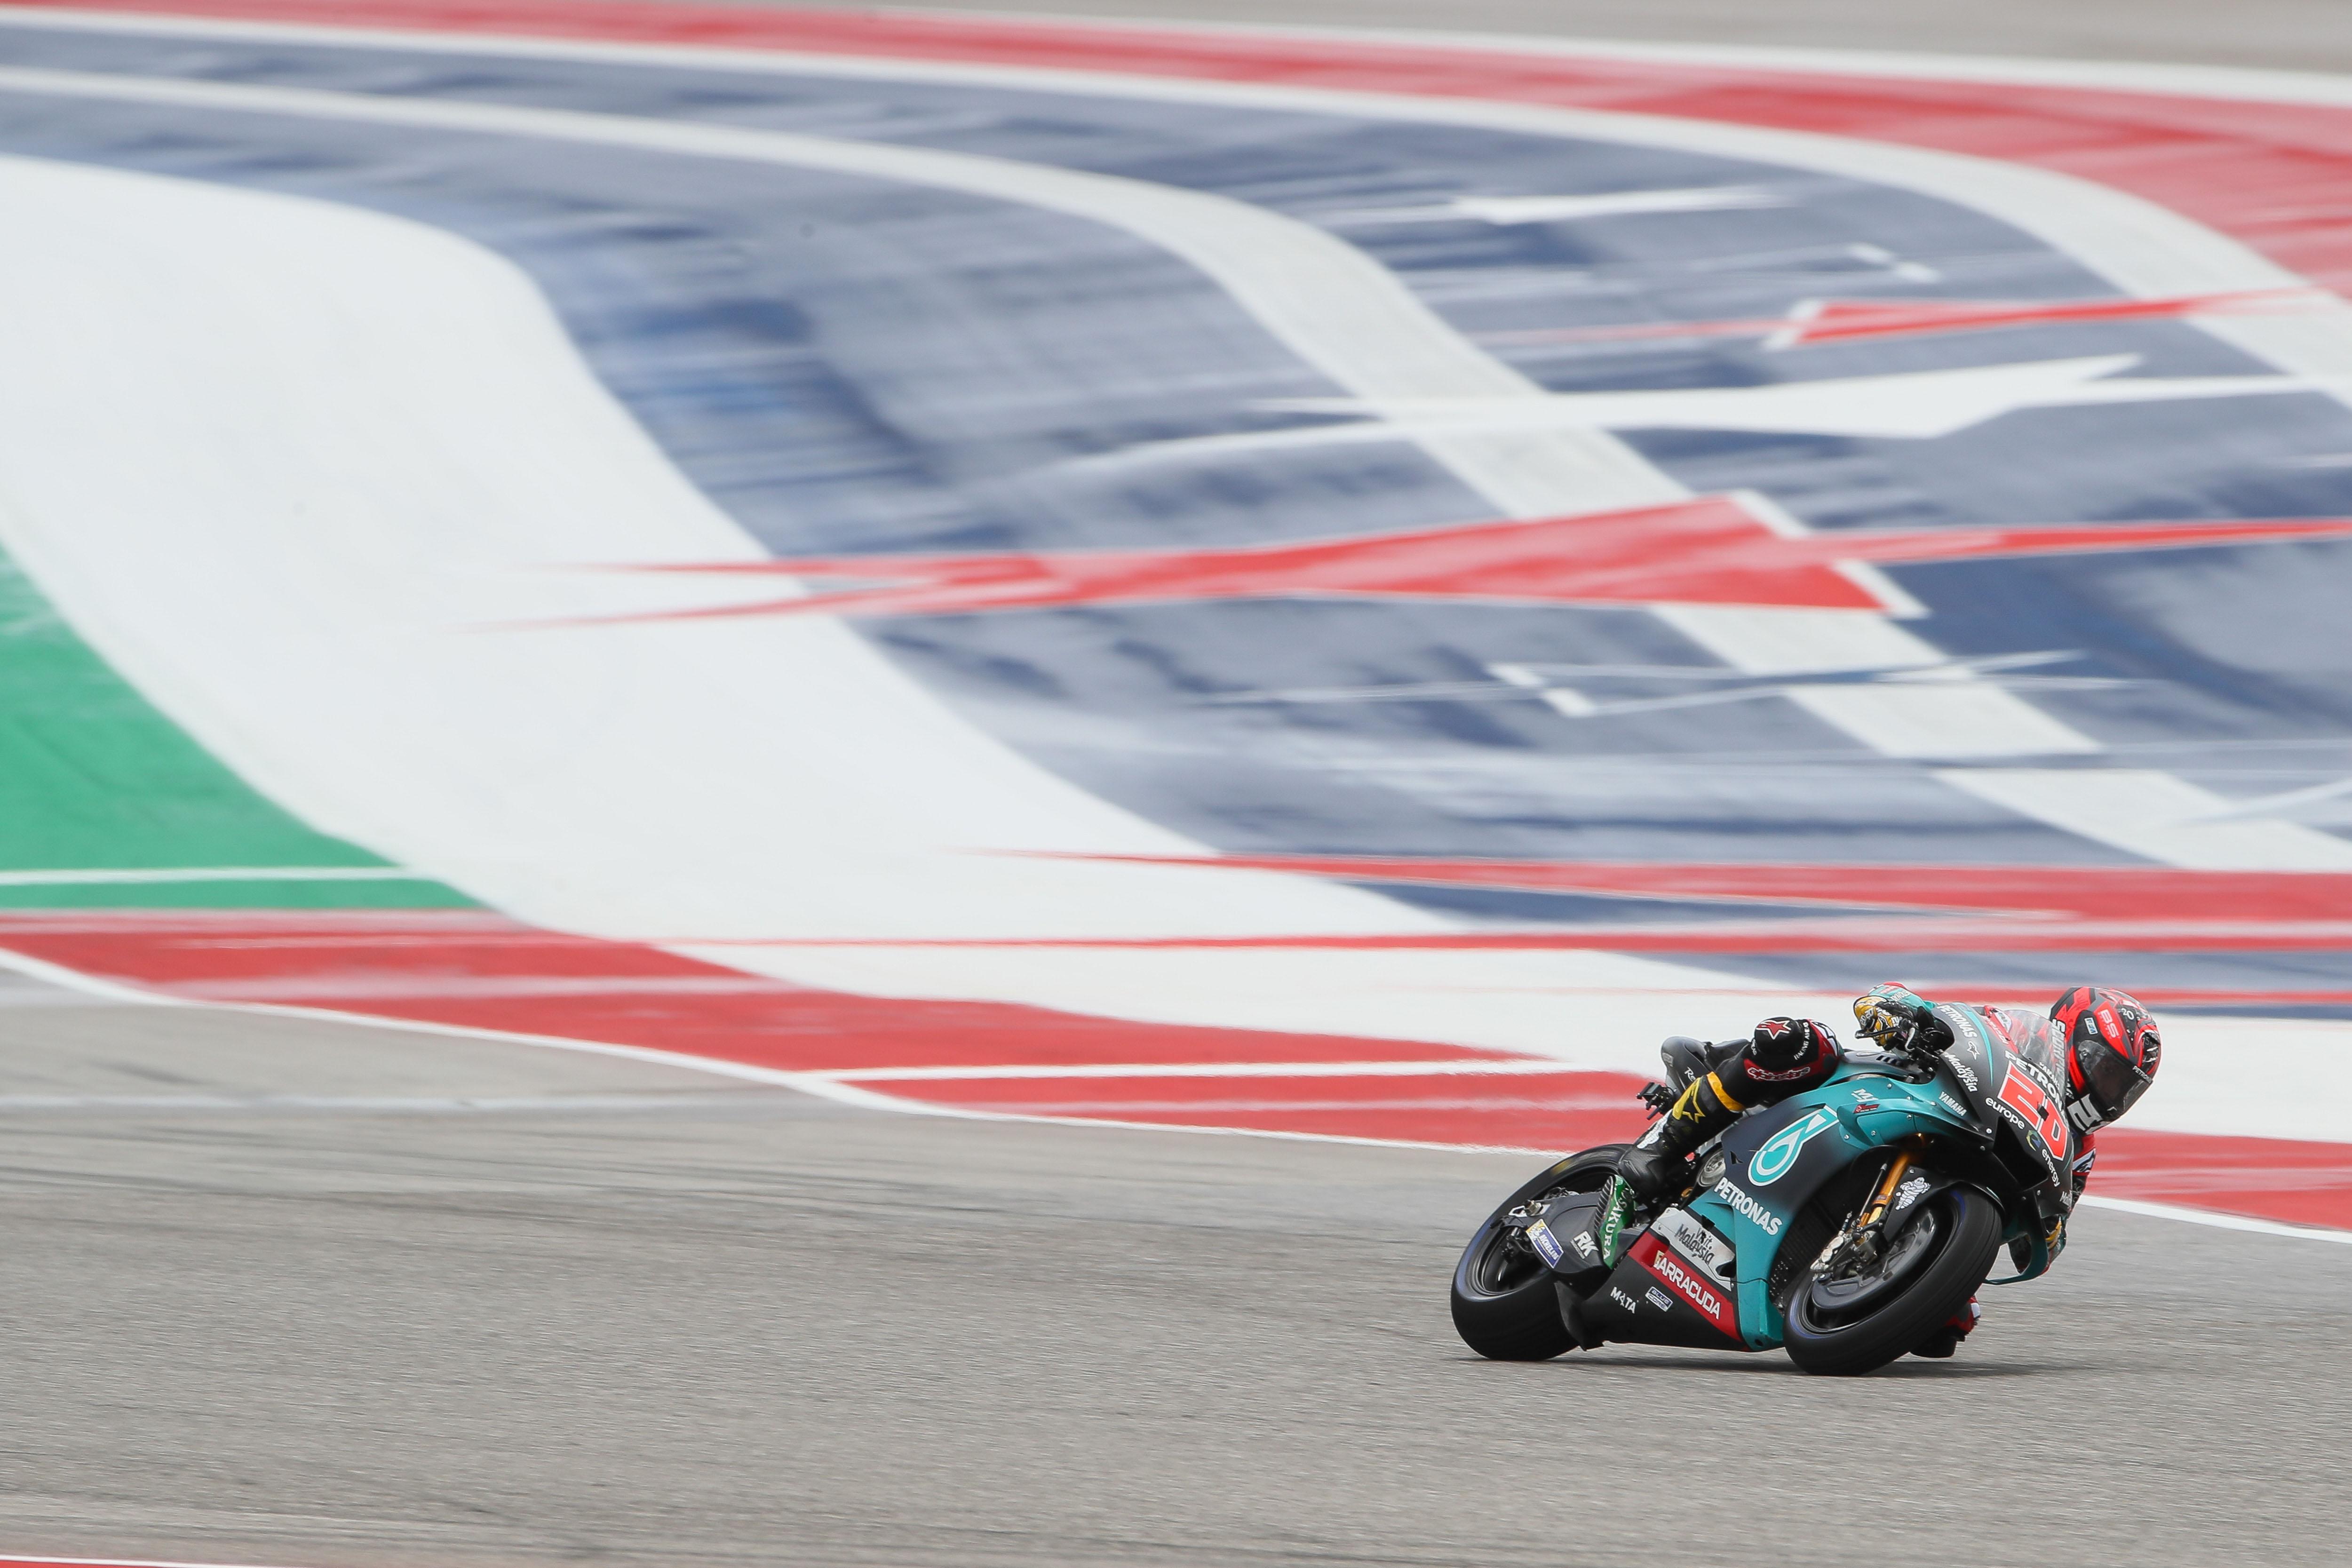 Fabio Quartararo Petronas SRT Yamaha Austin MotoGP 2020